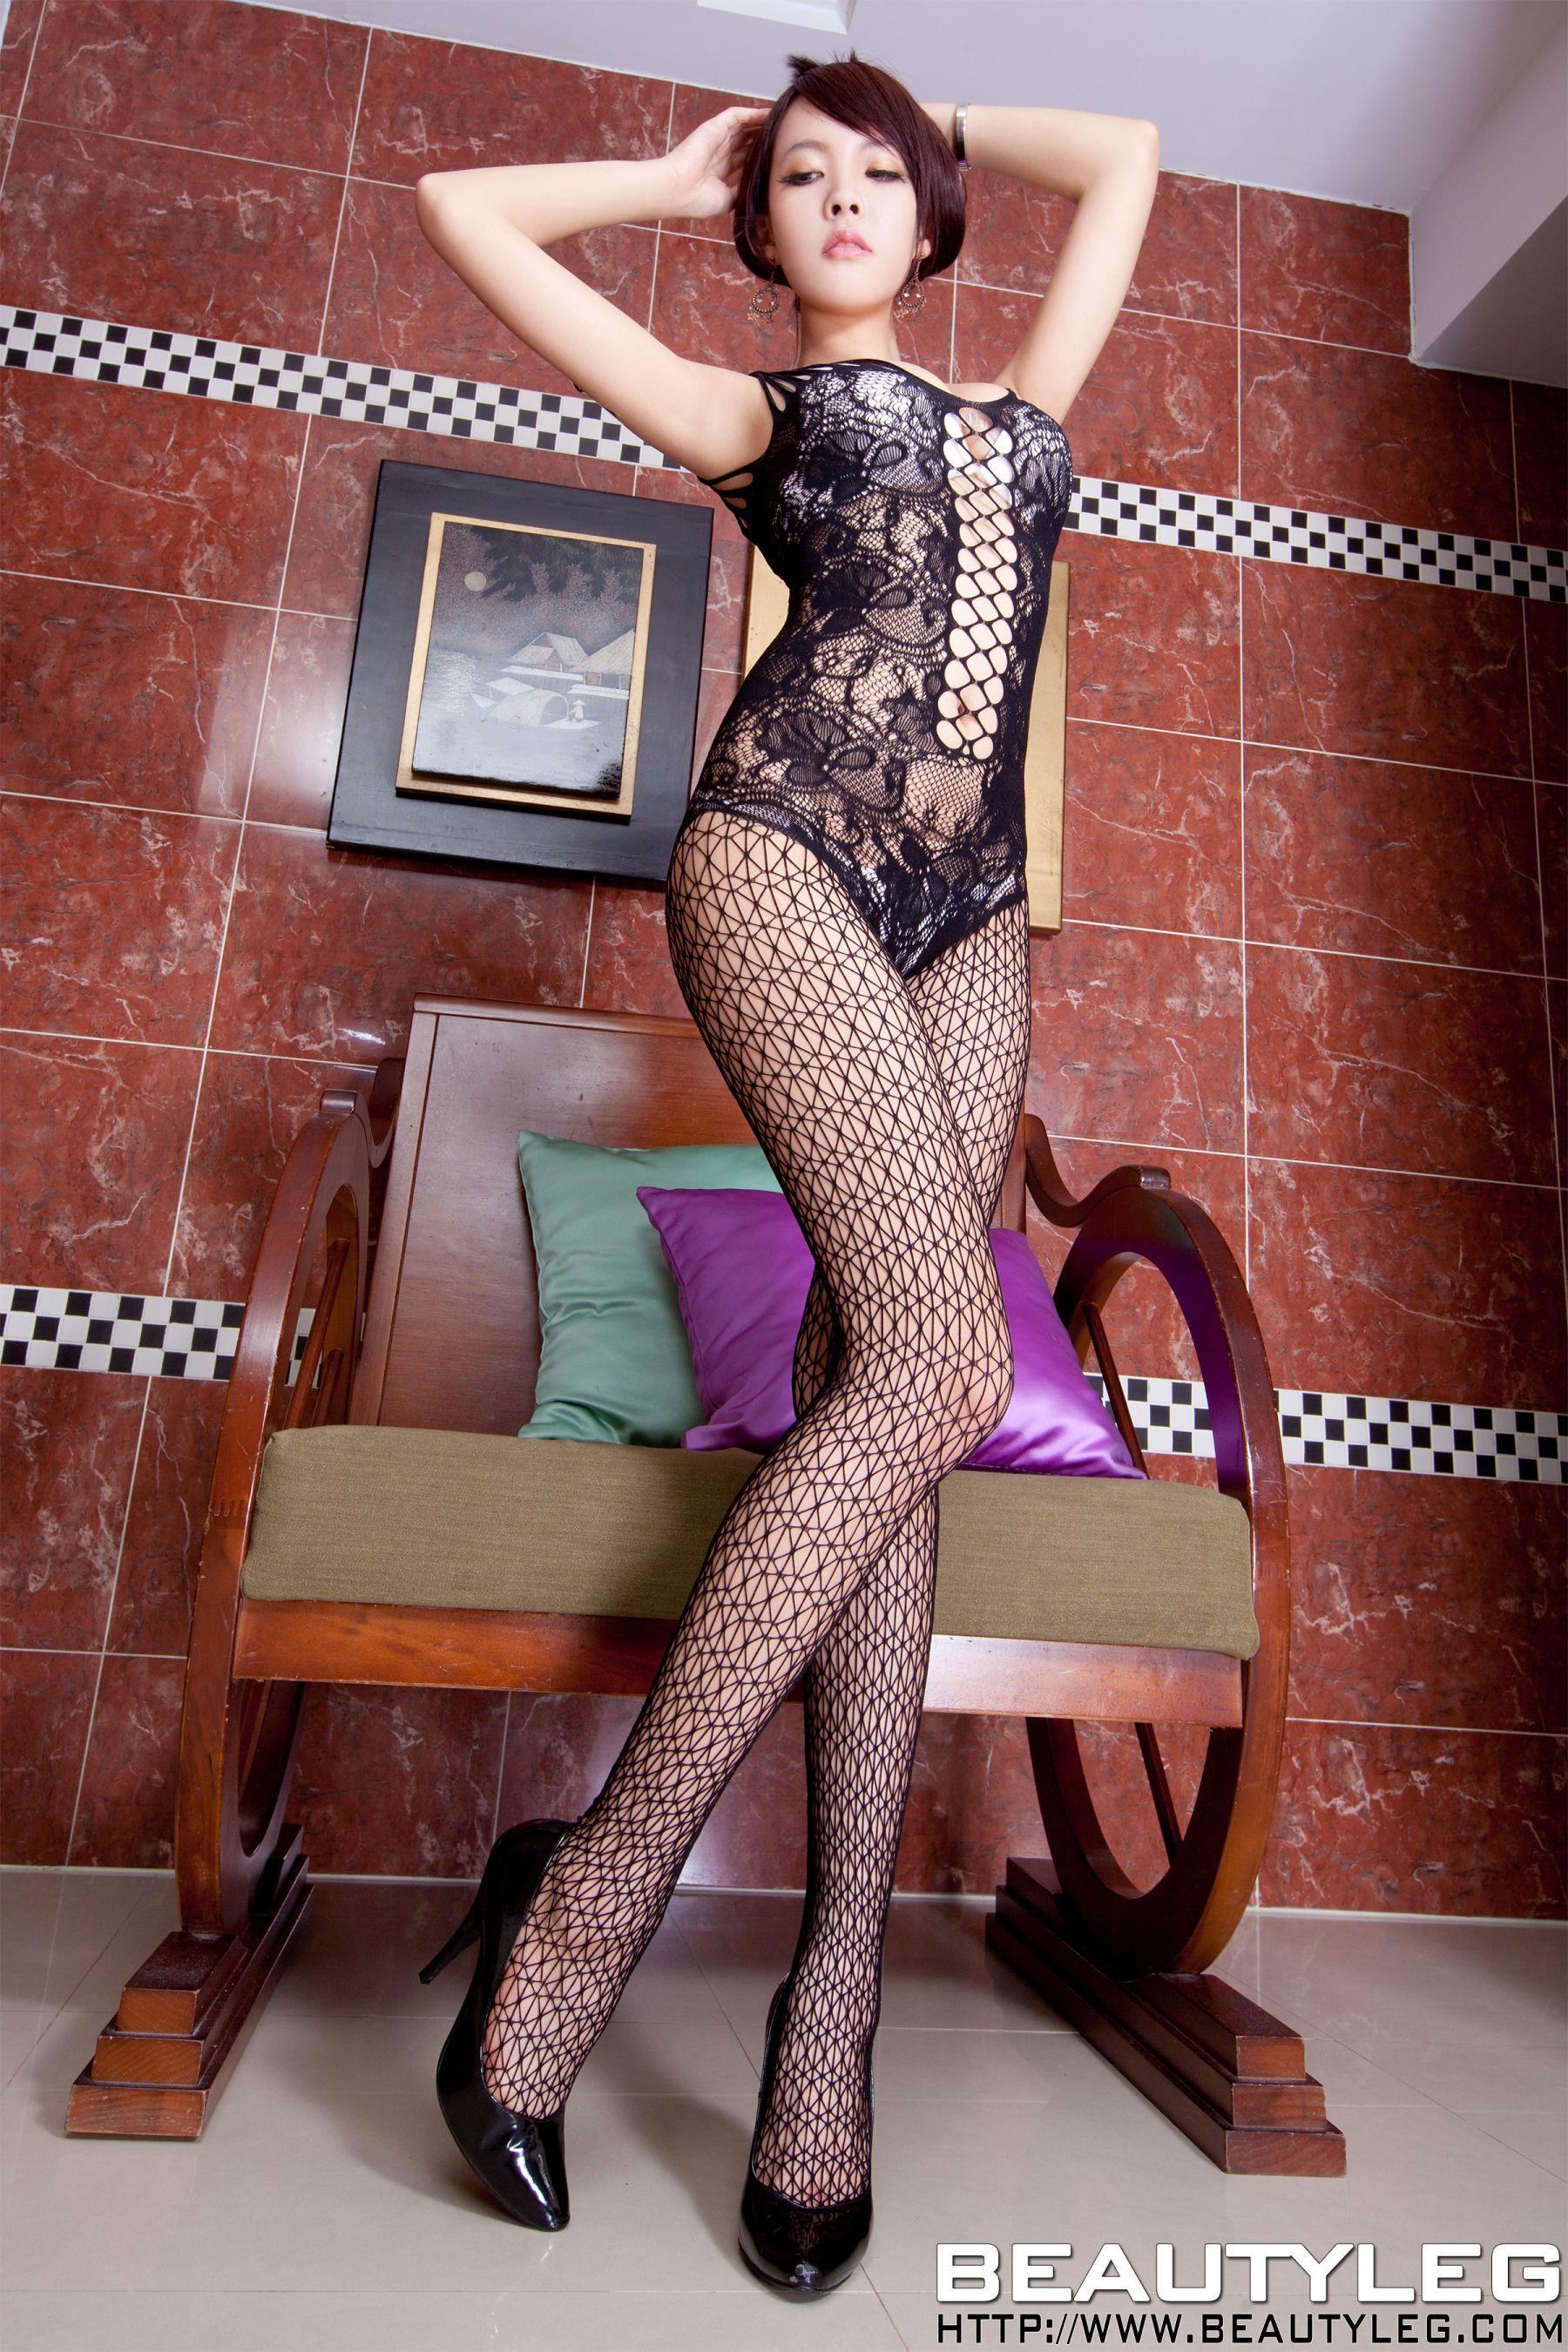 VOL.1993 [Beautyleg]丝袜美腿网袜情趣丝袜网衣:翁雨澄(腿模Aileen)高品质写真套图(47P)